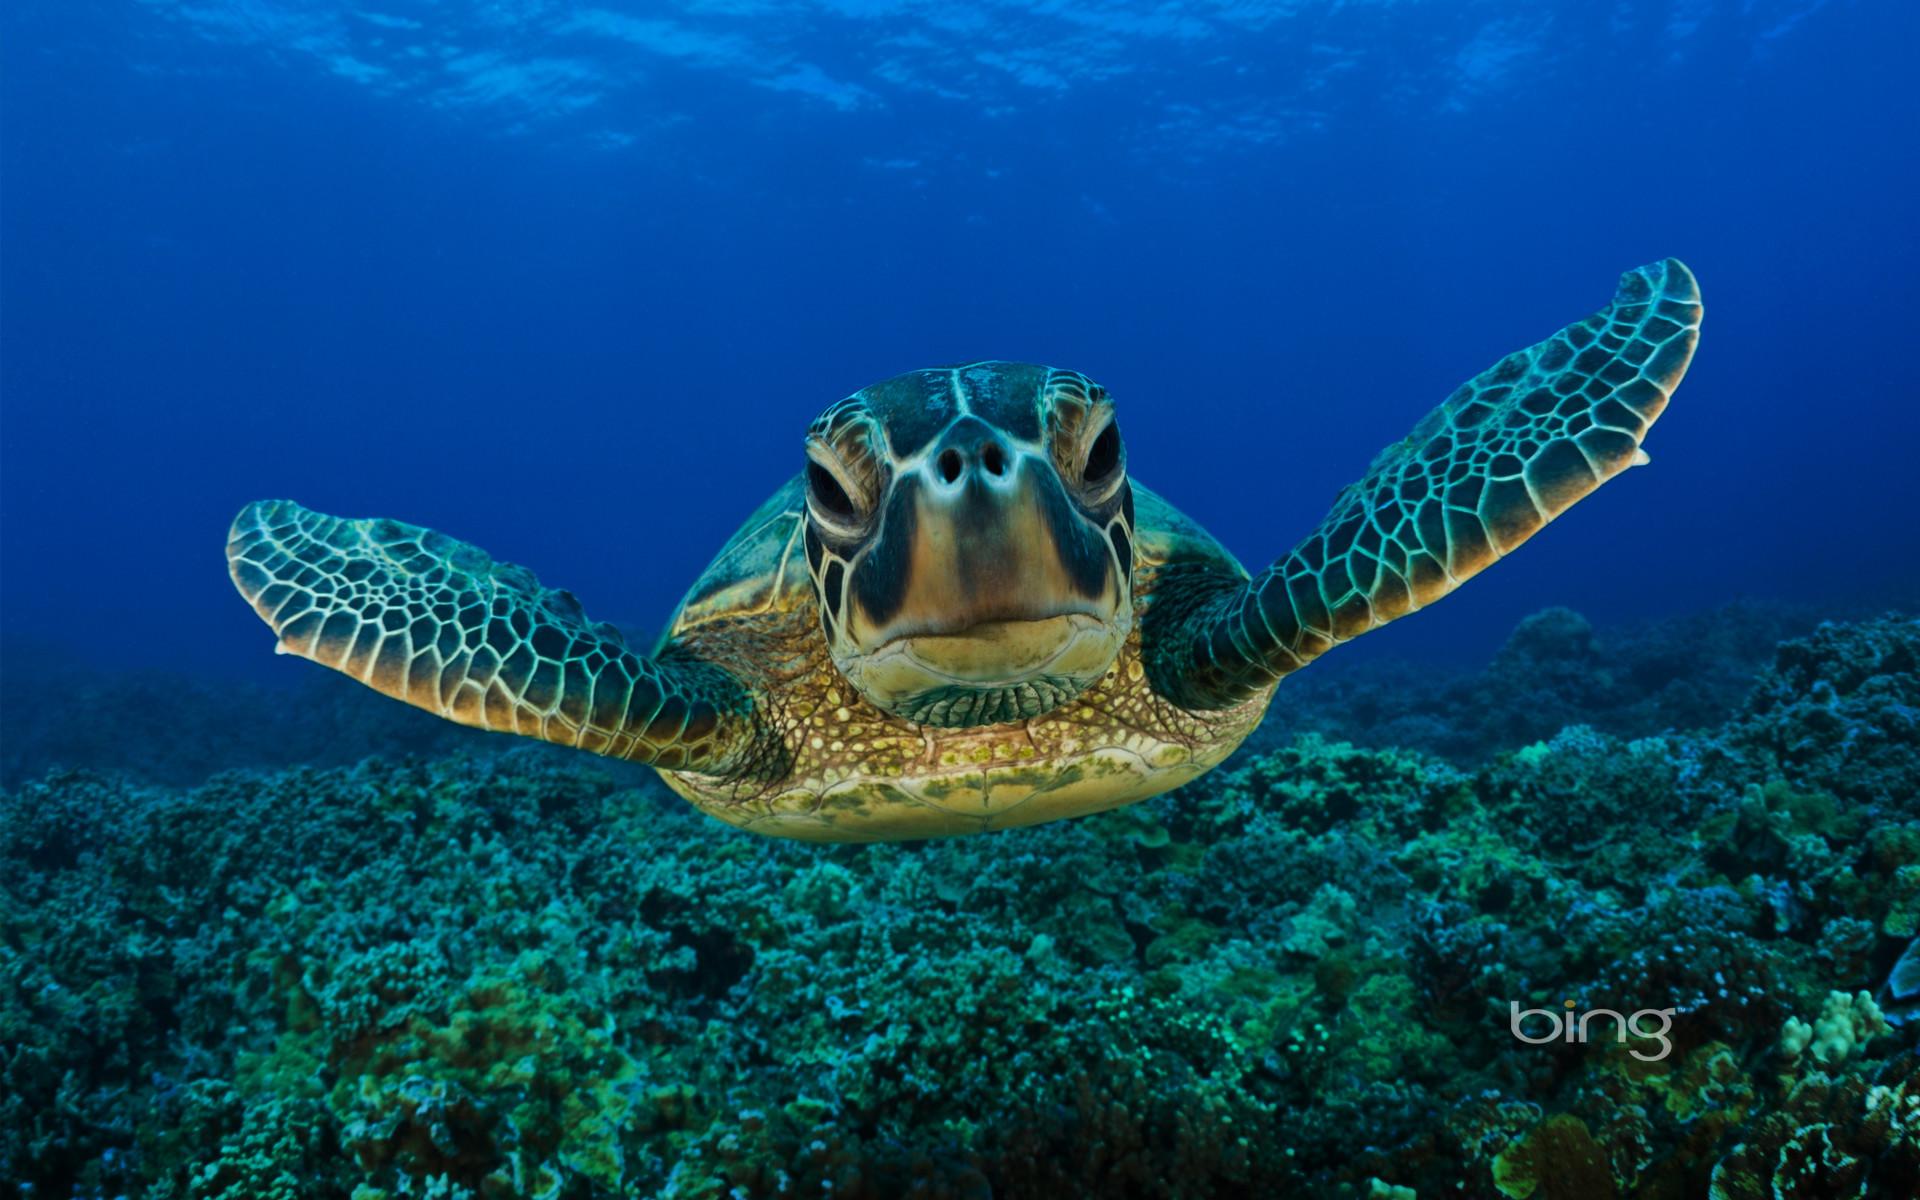 Sea Turtles Desktop Wallpaper (60+ Images